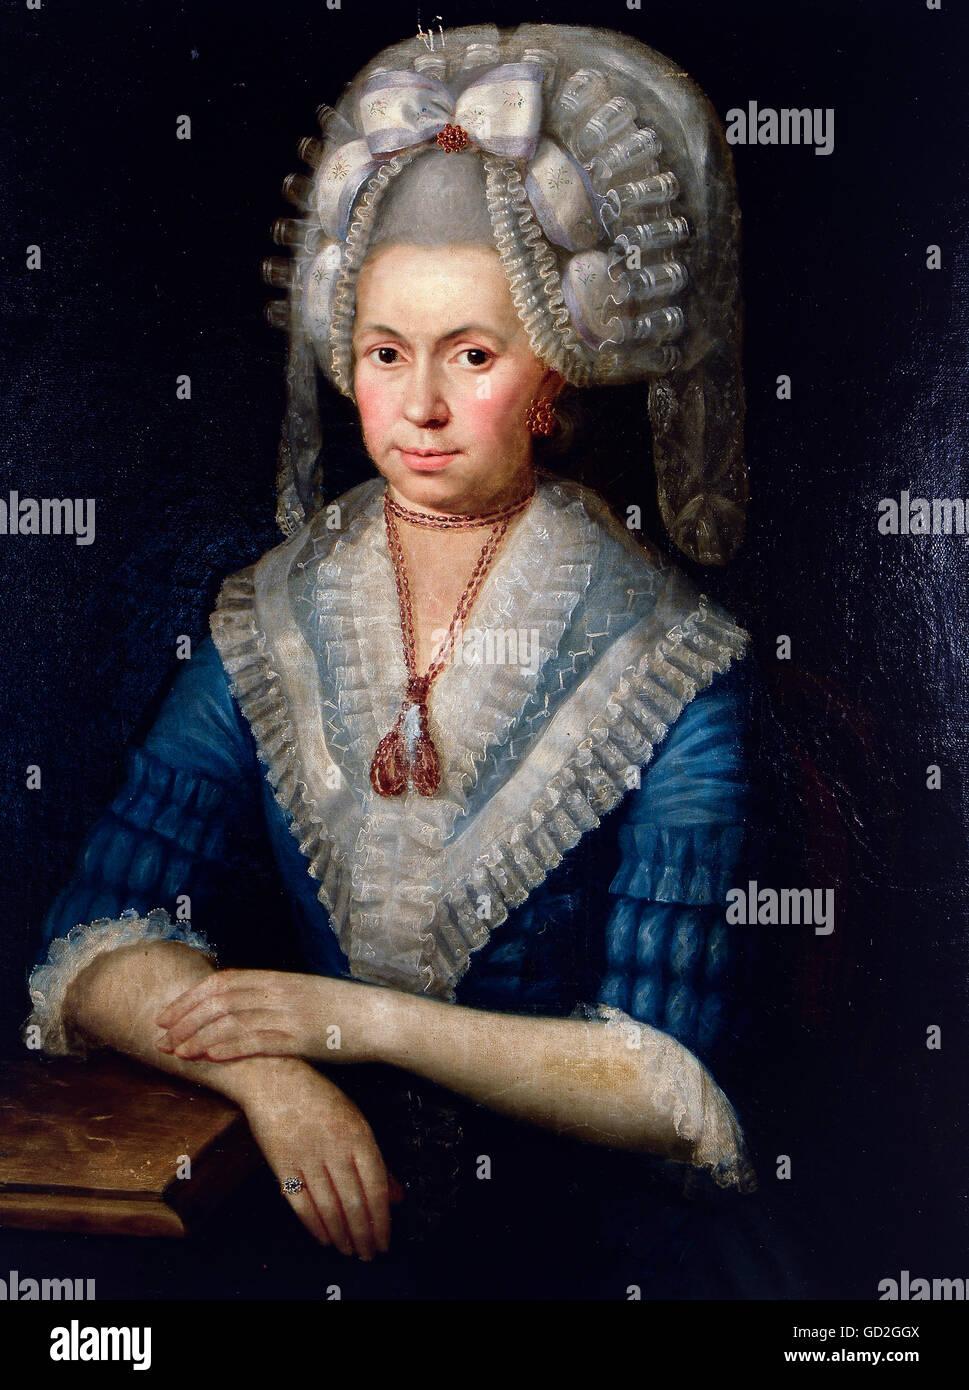 Menschen Frauen 16 18 Jahrhundert ältere Frau Malerei 18